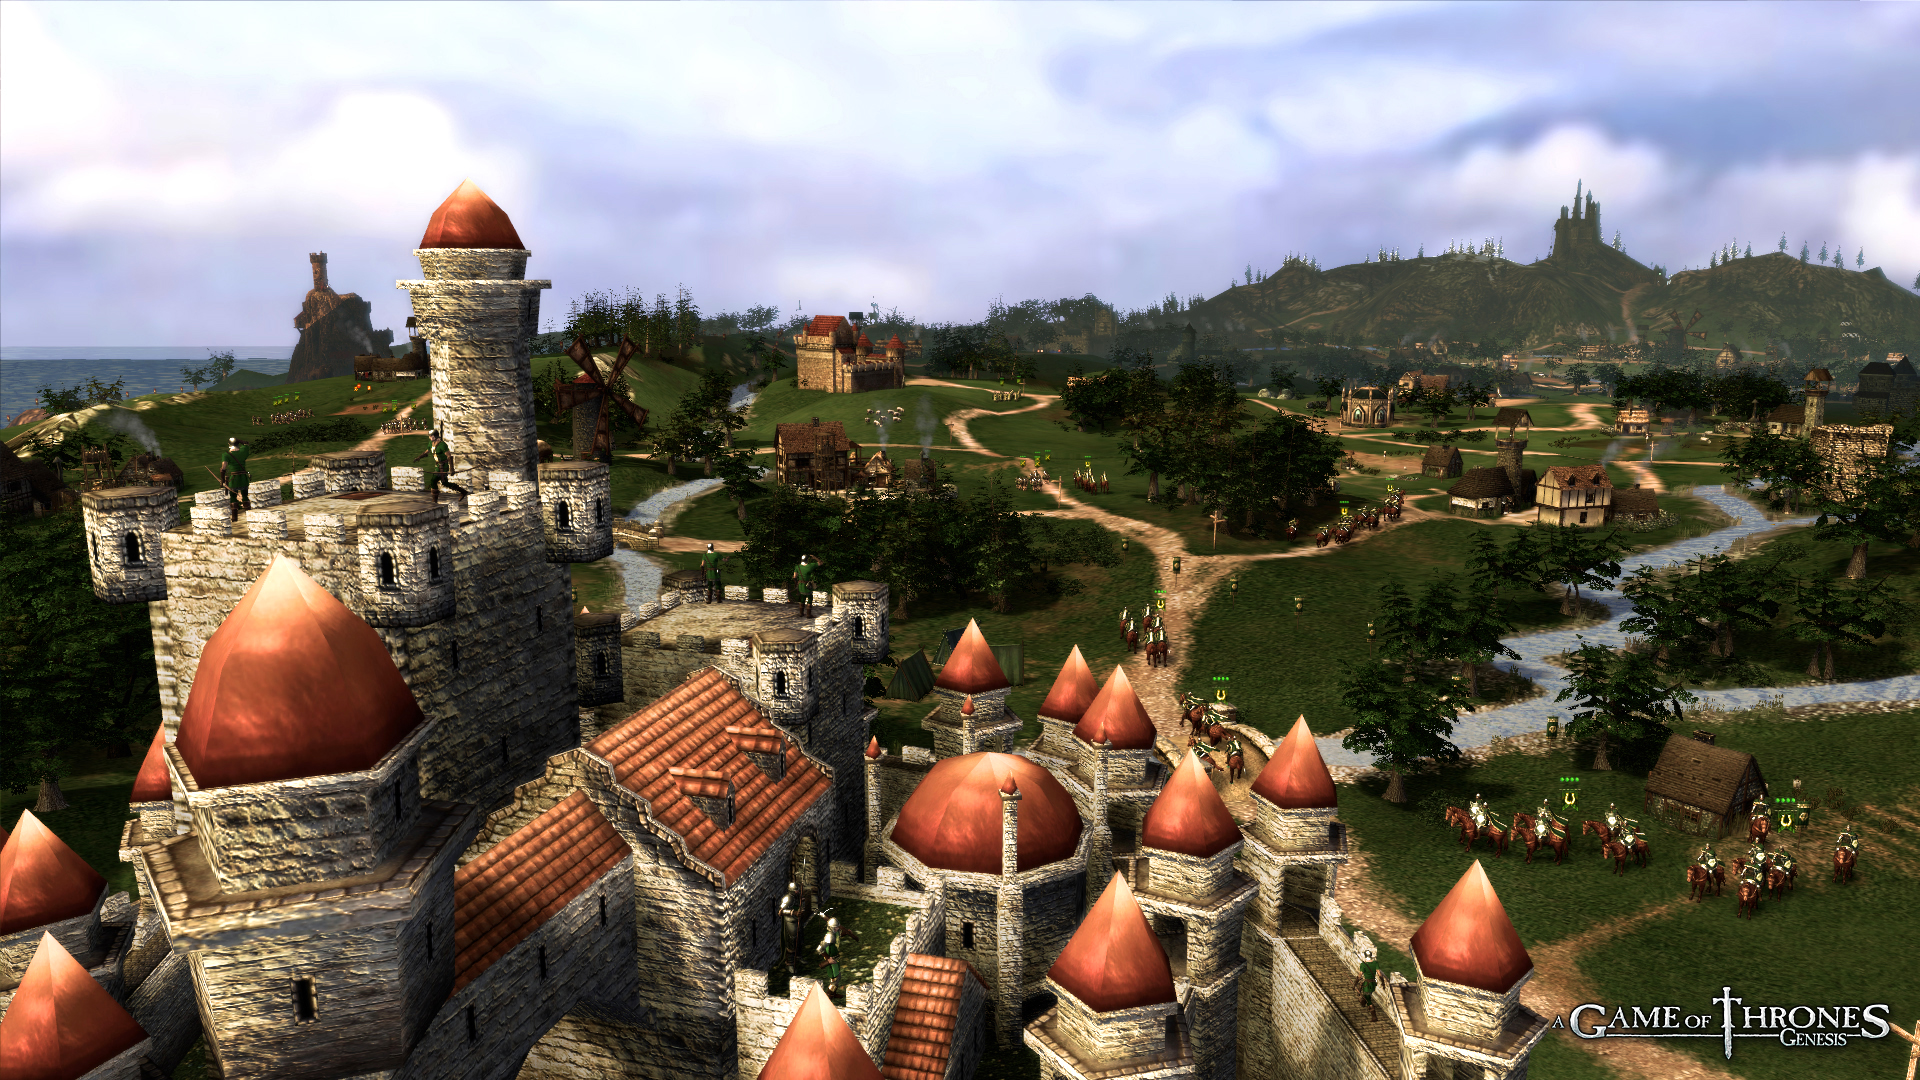 Imágenes de A Game of Thrones Genesis [Screenshots]